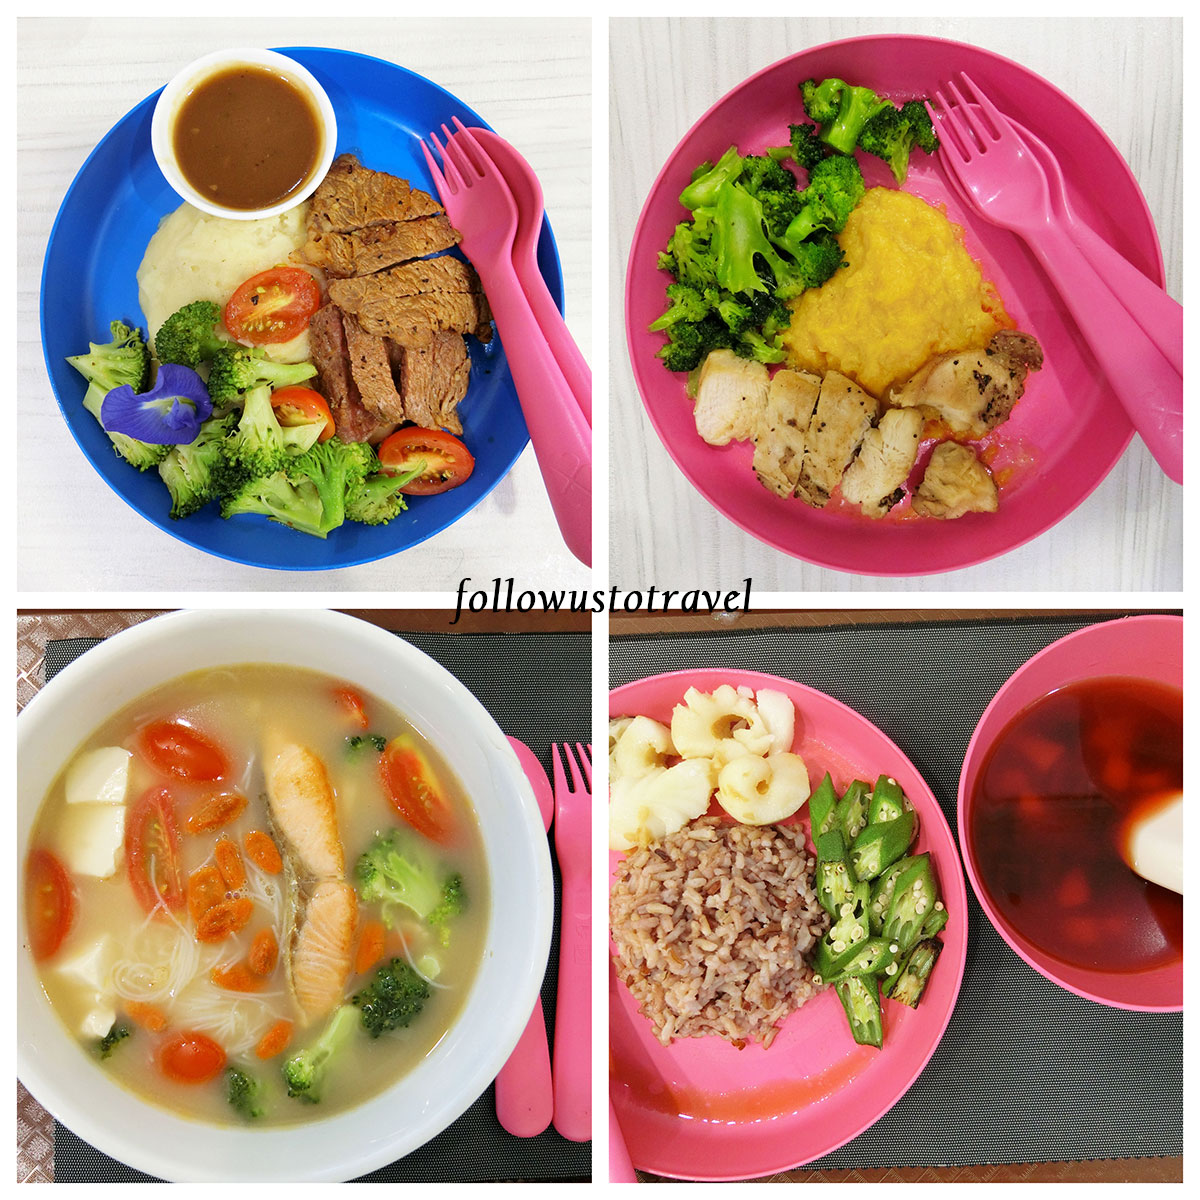 amaby parenting confinement centre 月子餐儿童餐